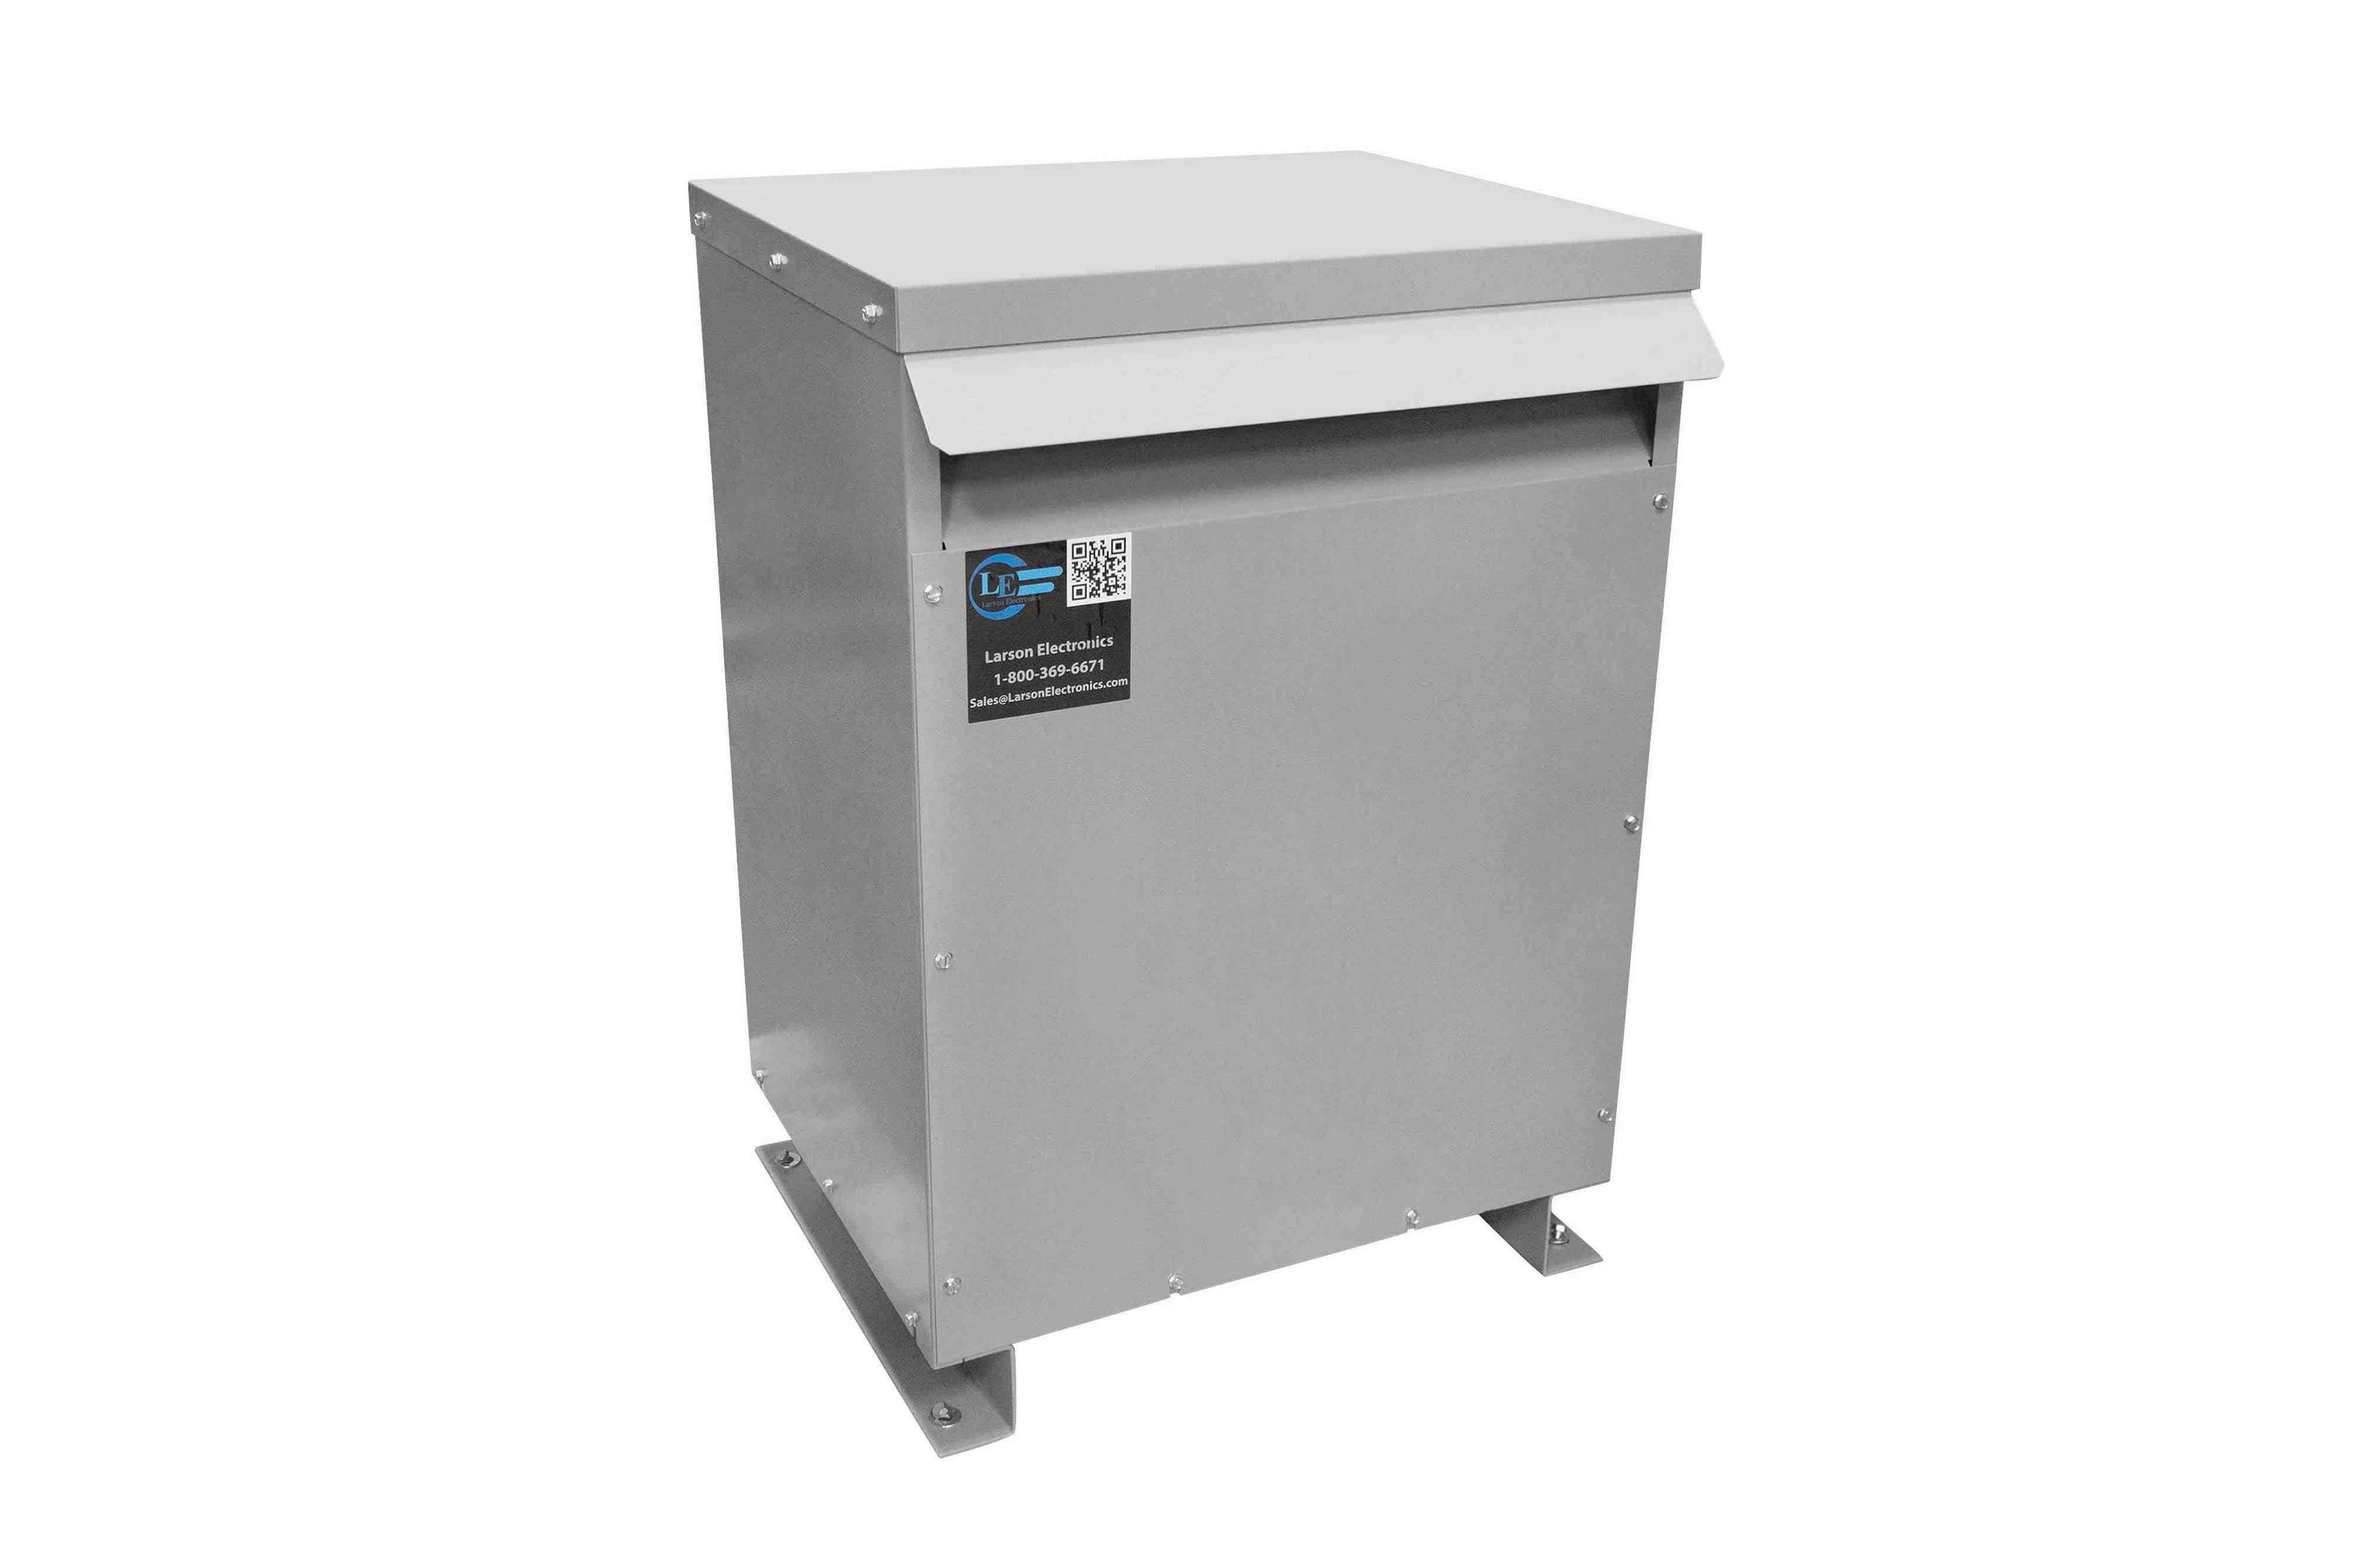 26 kVA 3PH Isolation Transformer, 575V Wye Primary, 208Y/120 Wye-N Secondary, N3R, Ventilated, 60 Hz